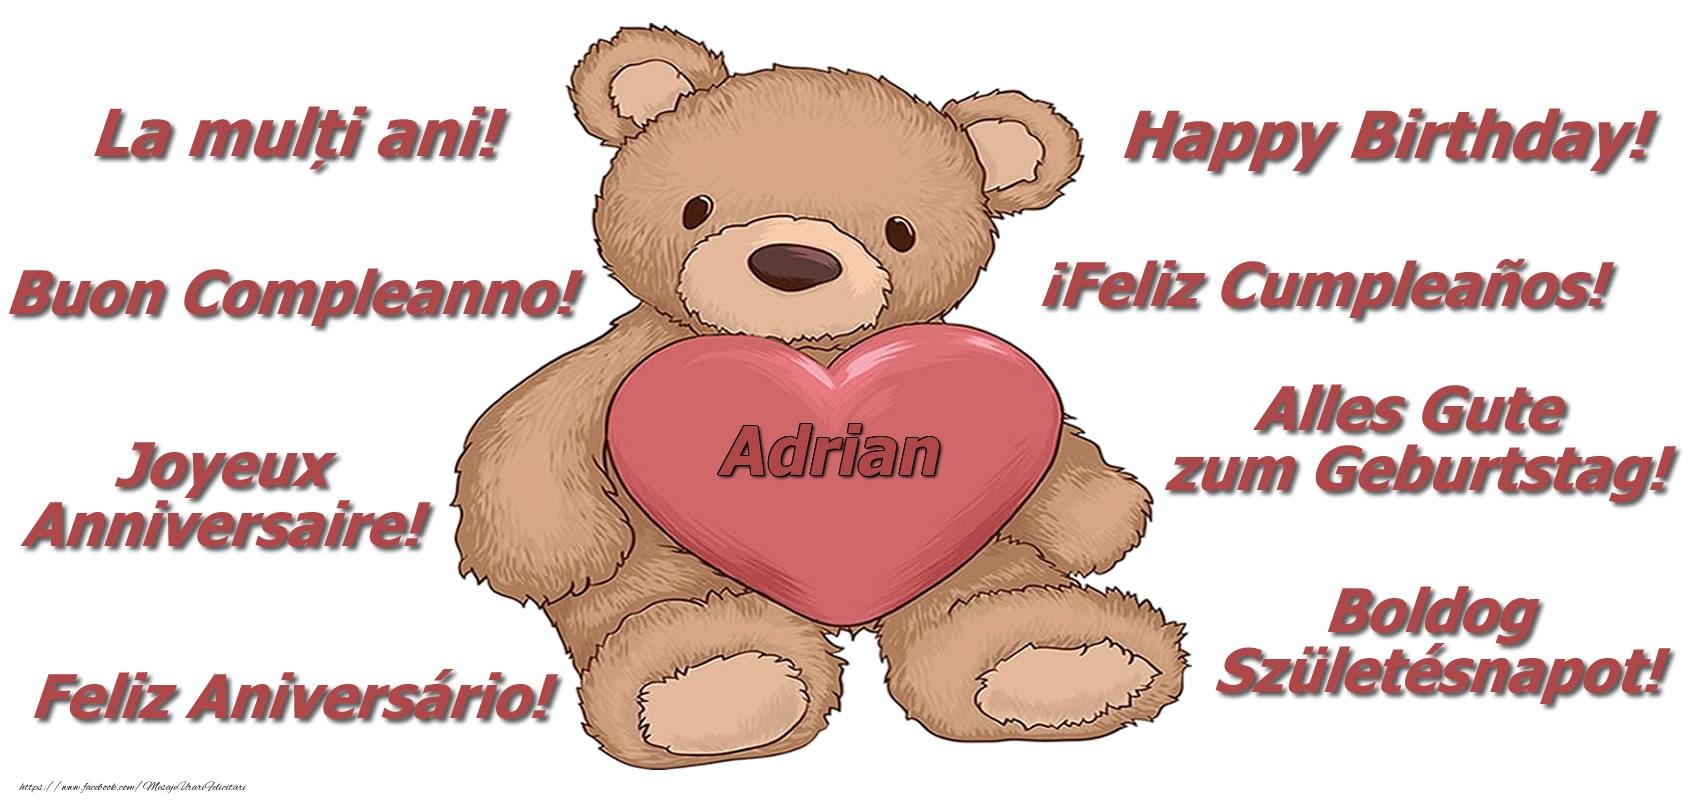 Felicitari de zi de nastere - La multi ani Adrian! - Ursulet